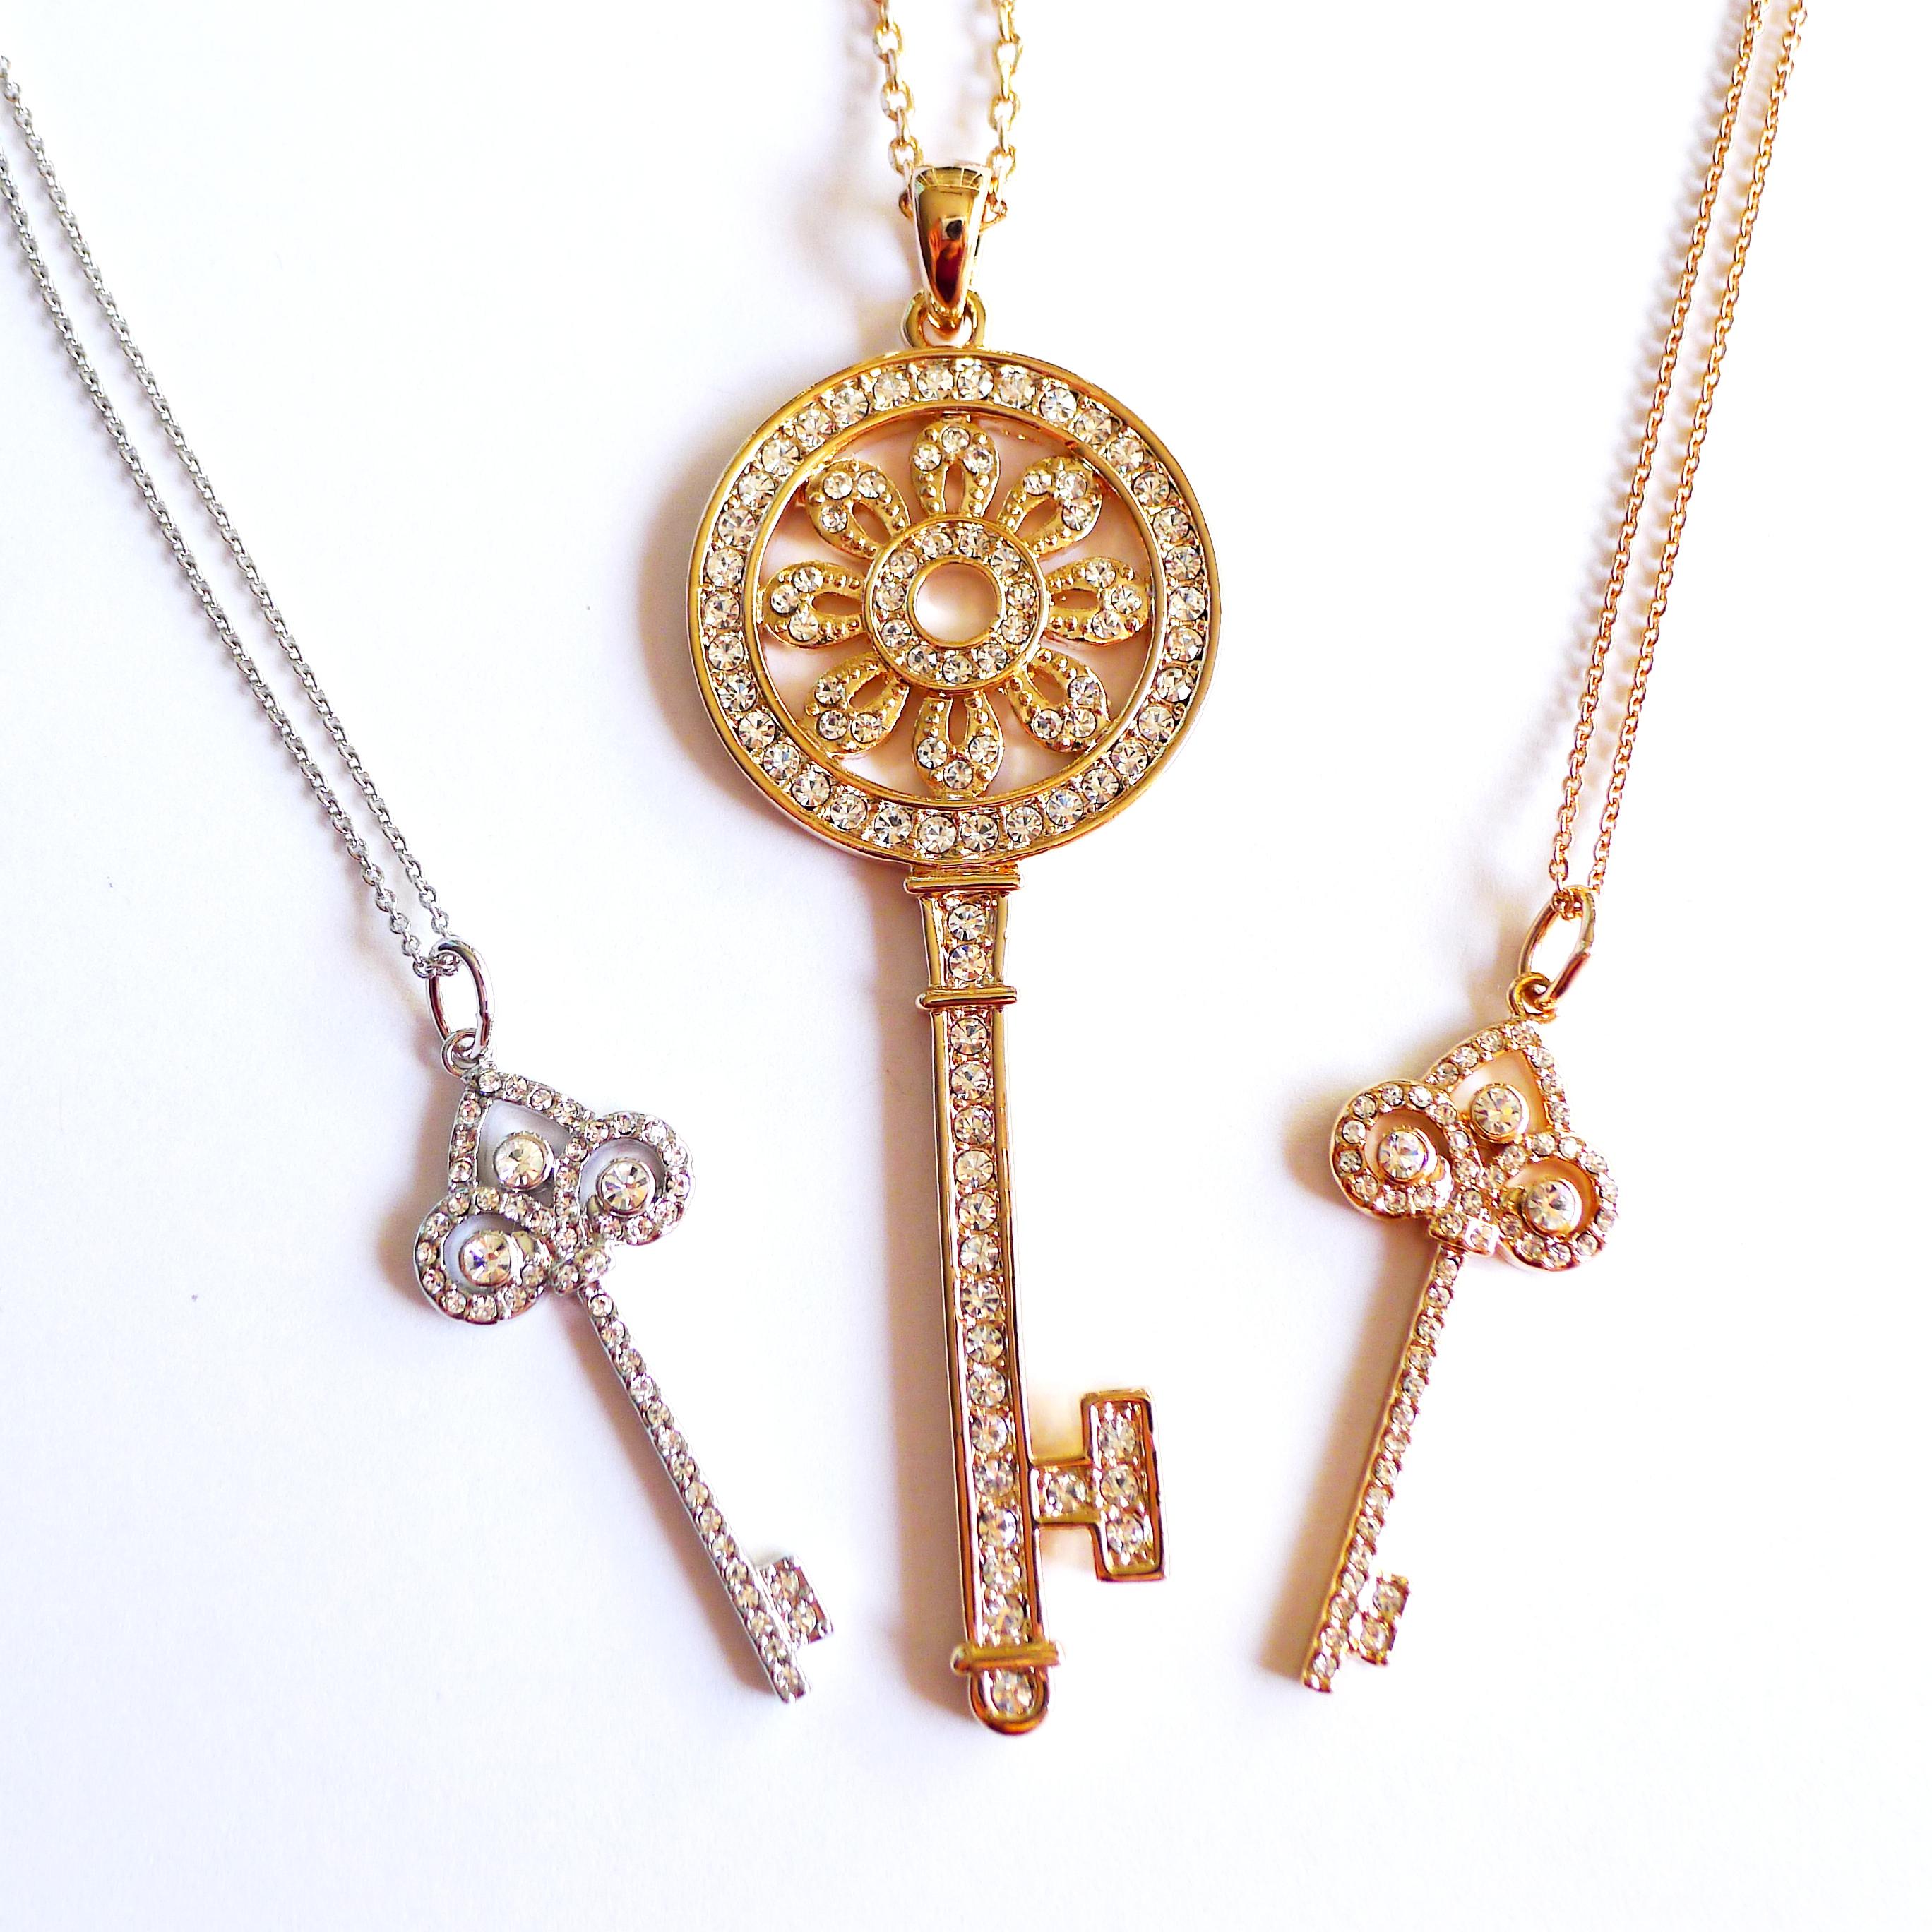 Smith fleur de lis key pendant with rose gold chain smith fleur de lis key pendant with rose gold chain thumbnail 1 mozeypictures Image collections